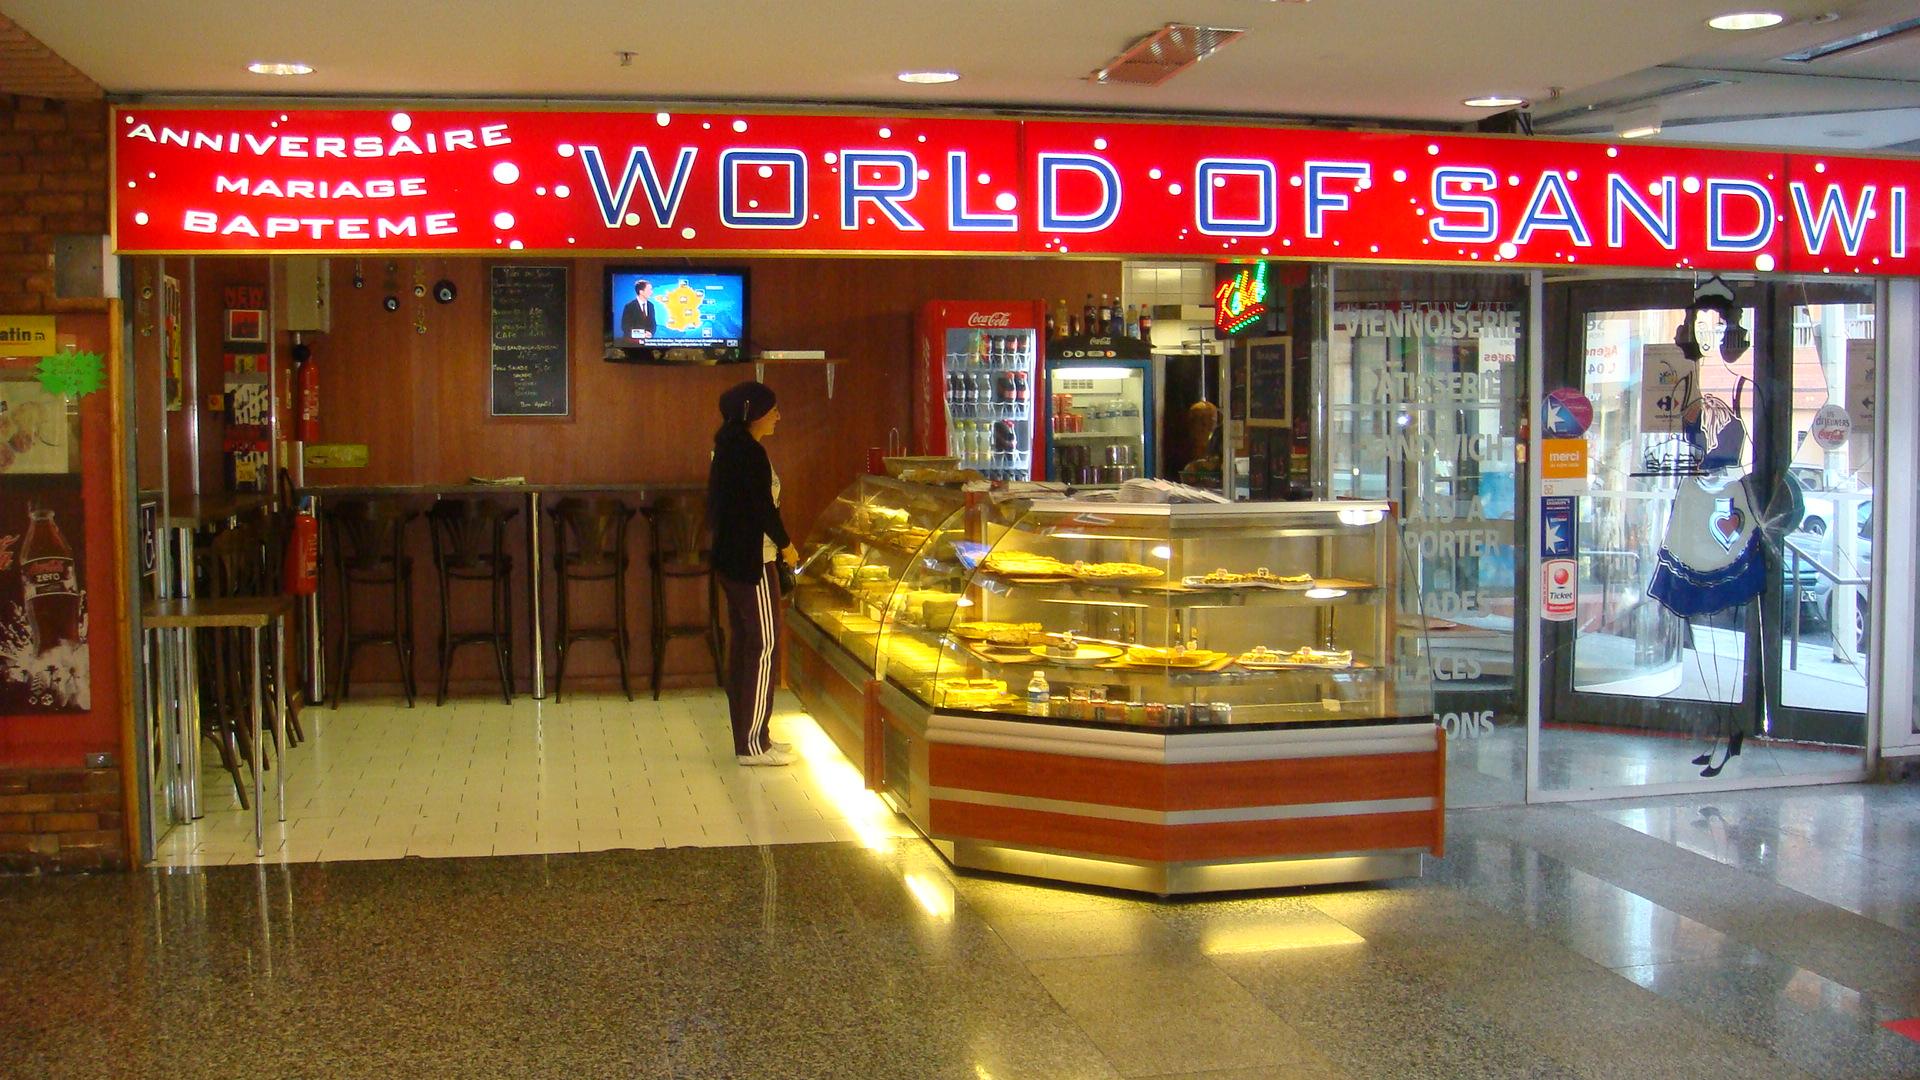 World of Sandwichs